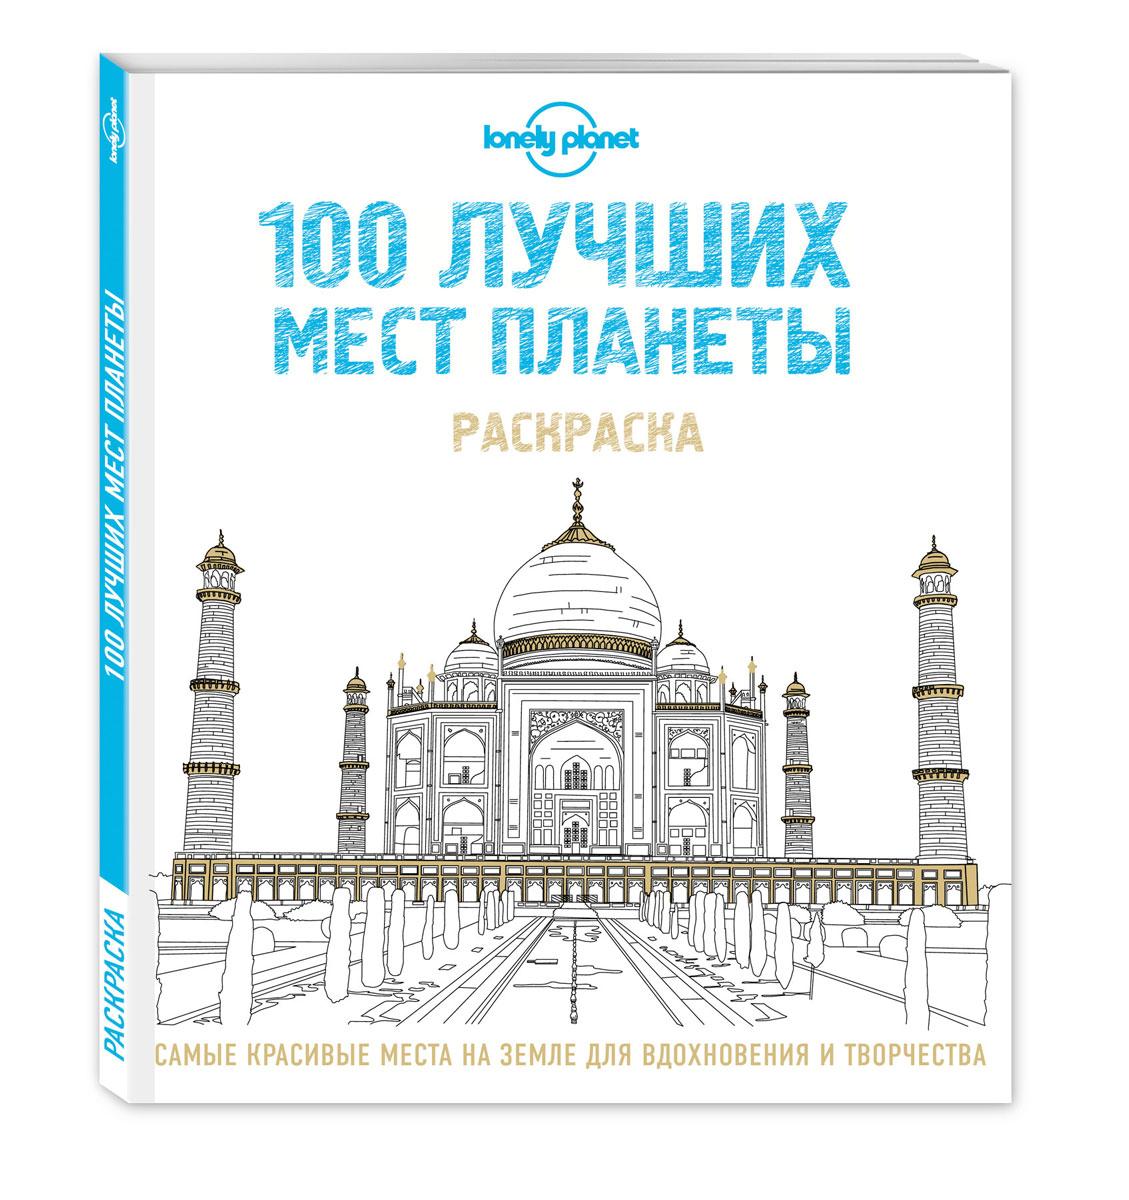 100 лучших мест планеты. Раскраска ISBN: 978-5-699-88261-8